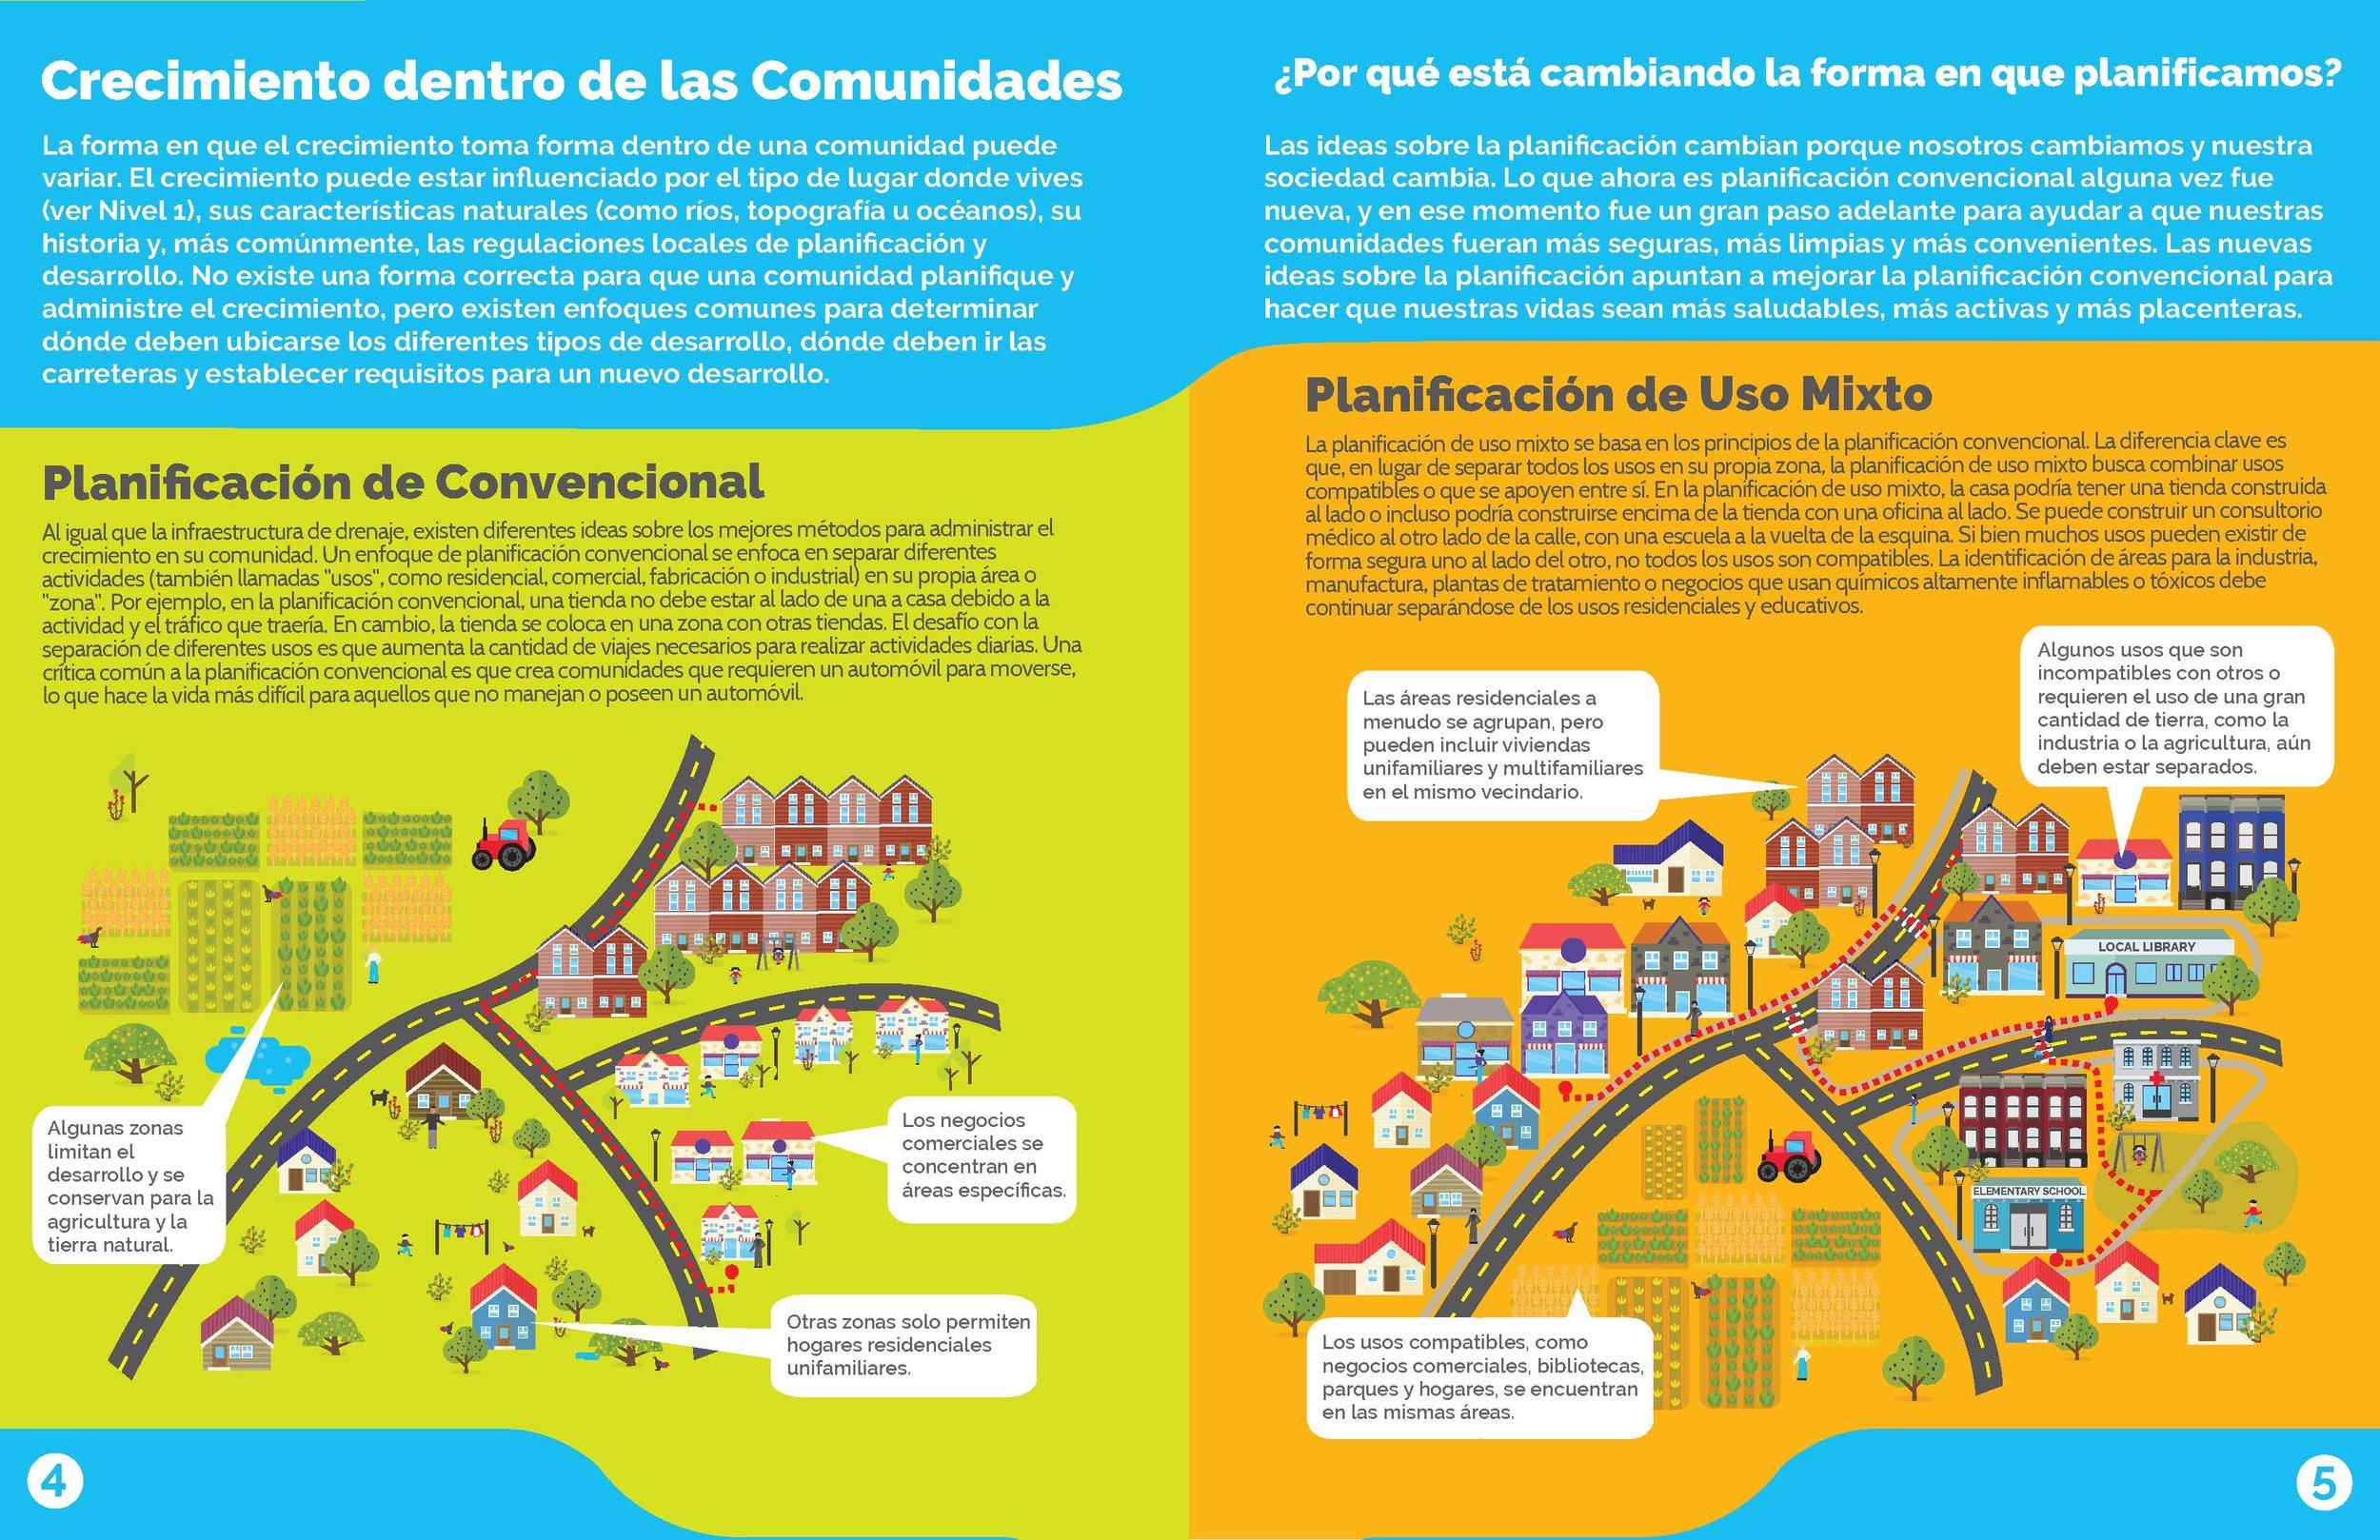 PLANNING + DEVELOPMENT LEVEL 2_posters_SPANISH 3.jpg